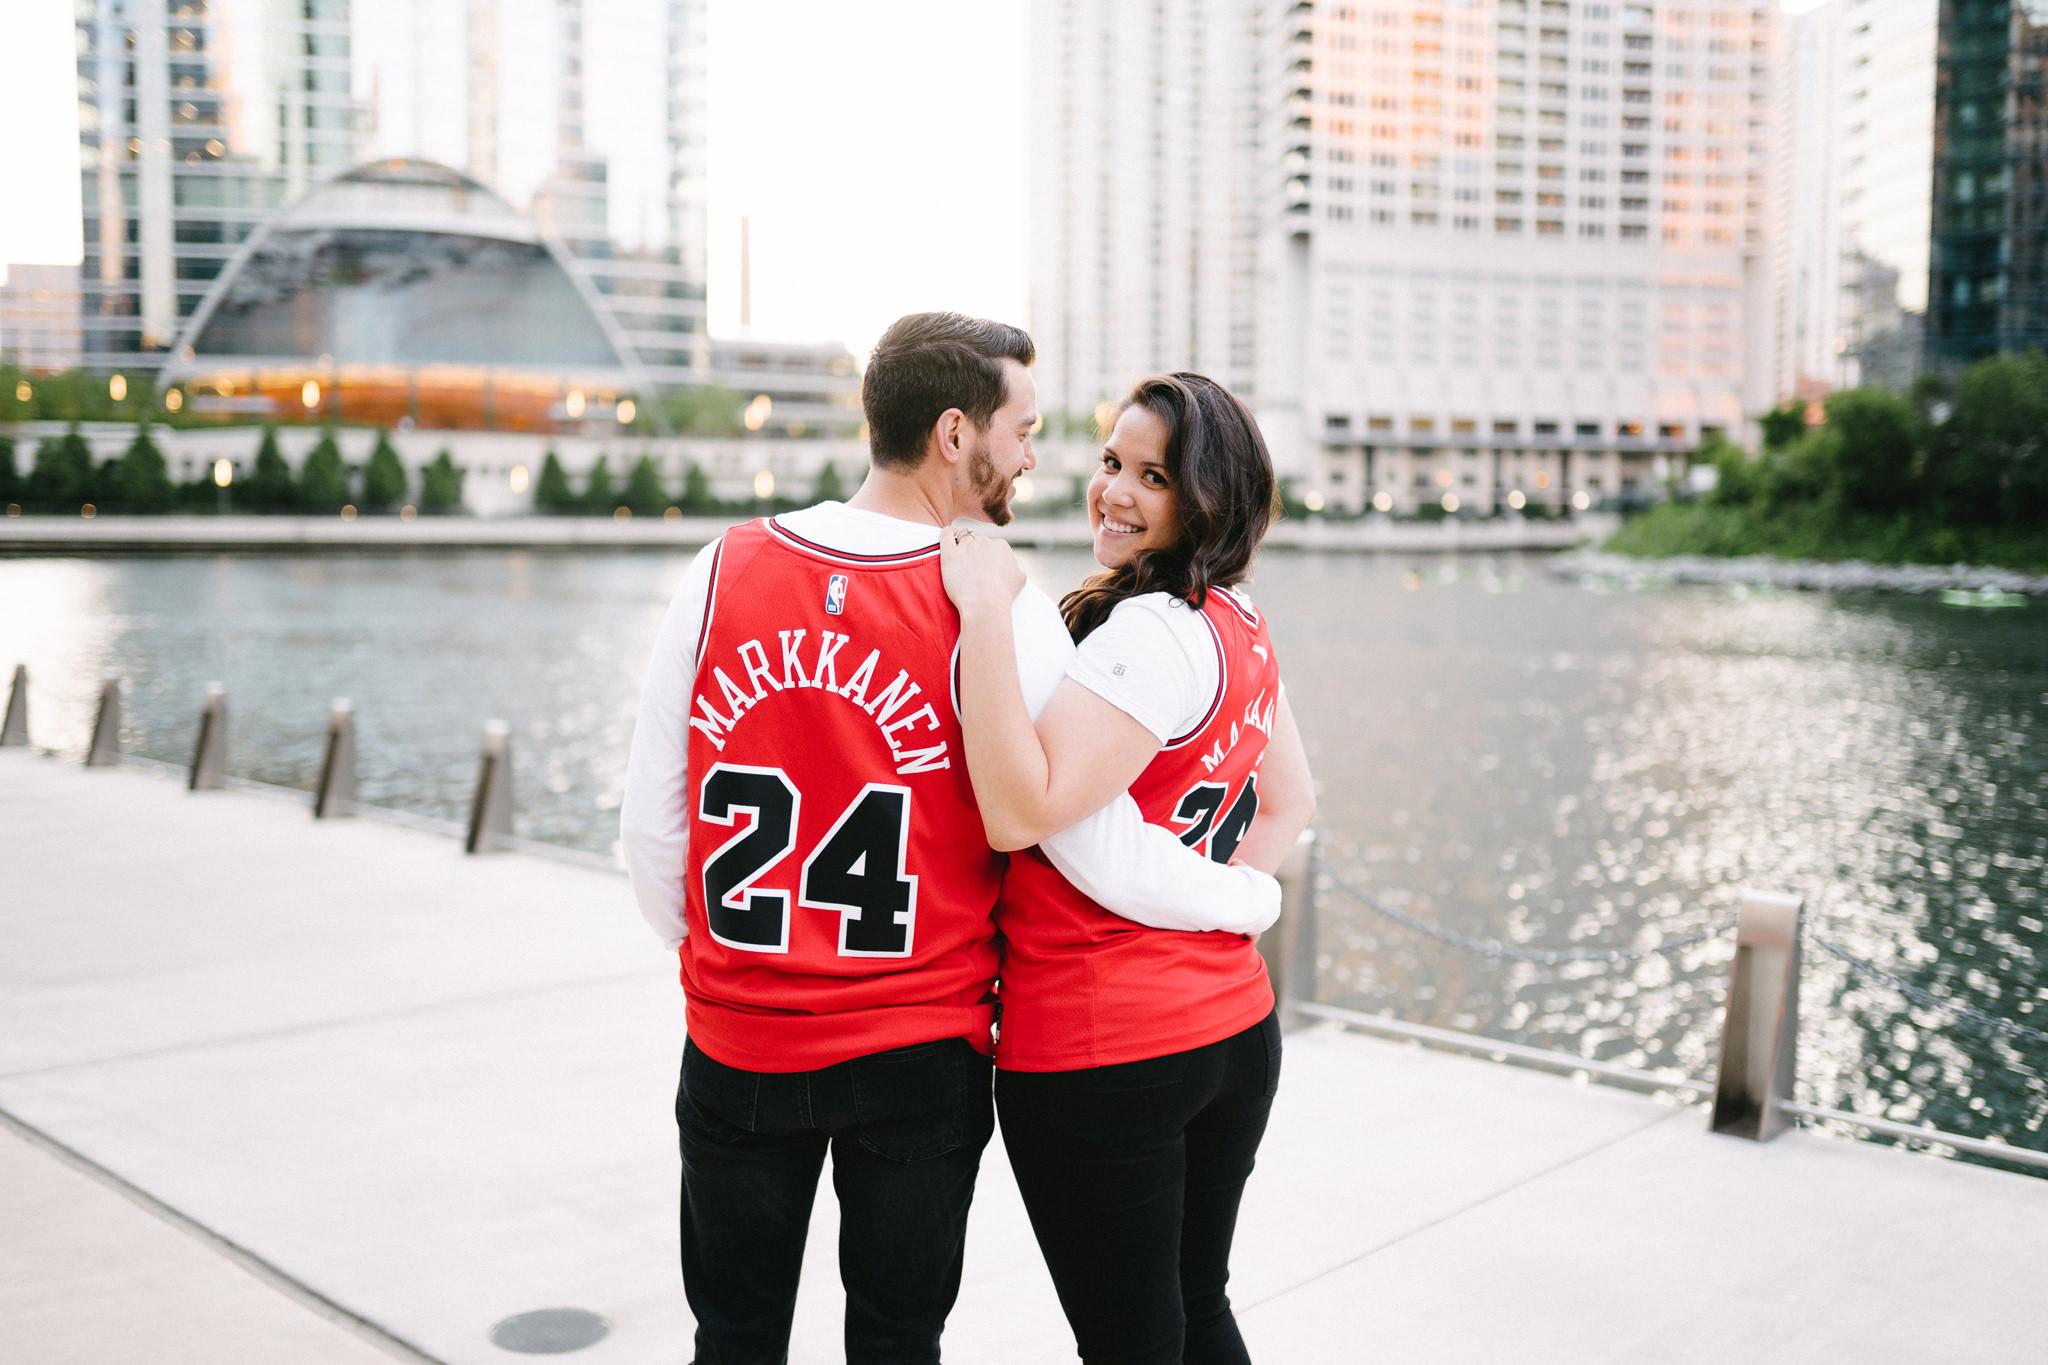 017-rempel-photography-chicago-wedding-inspiration-matt-mariana-riverwalk-engagement-session-city-view-loft-ohana-events.jpg